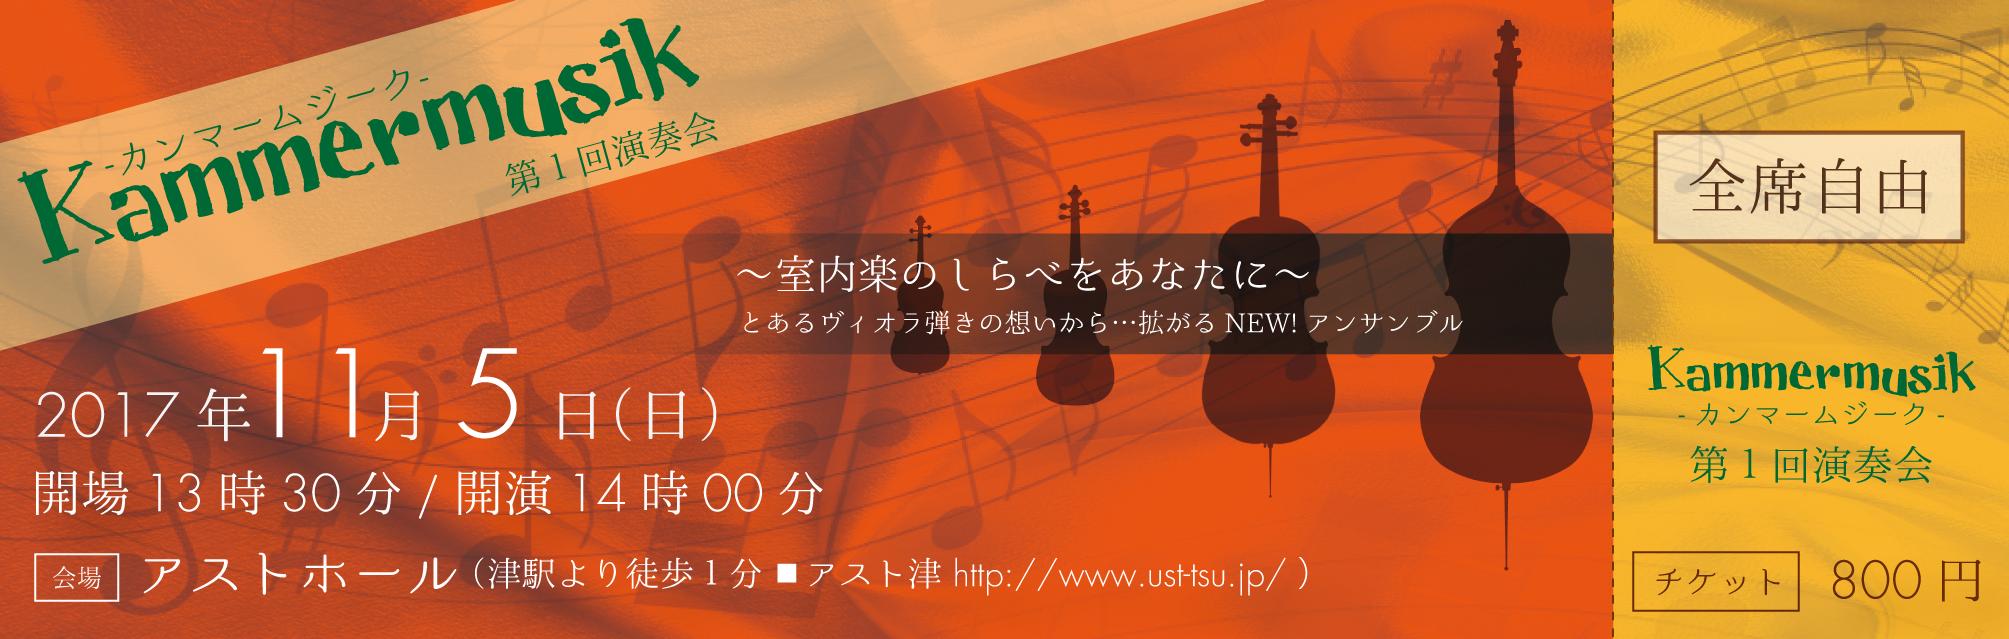 Kammermusik-Concert VOL.1 Ticket3